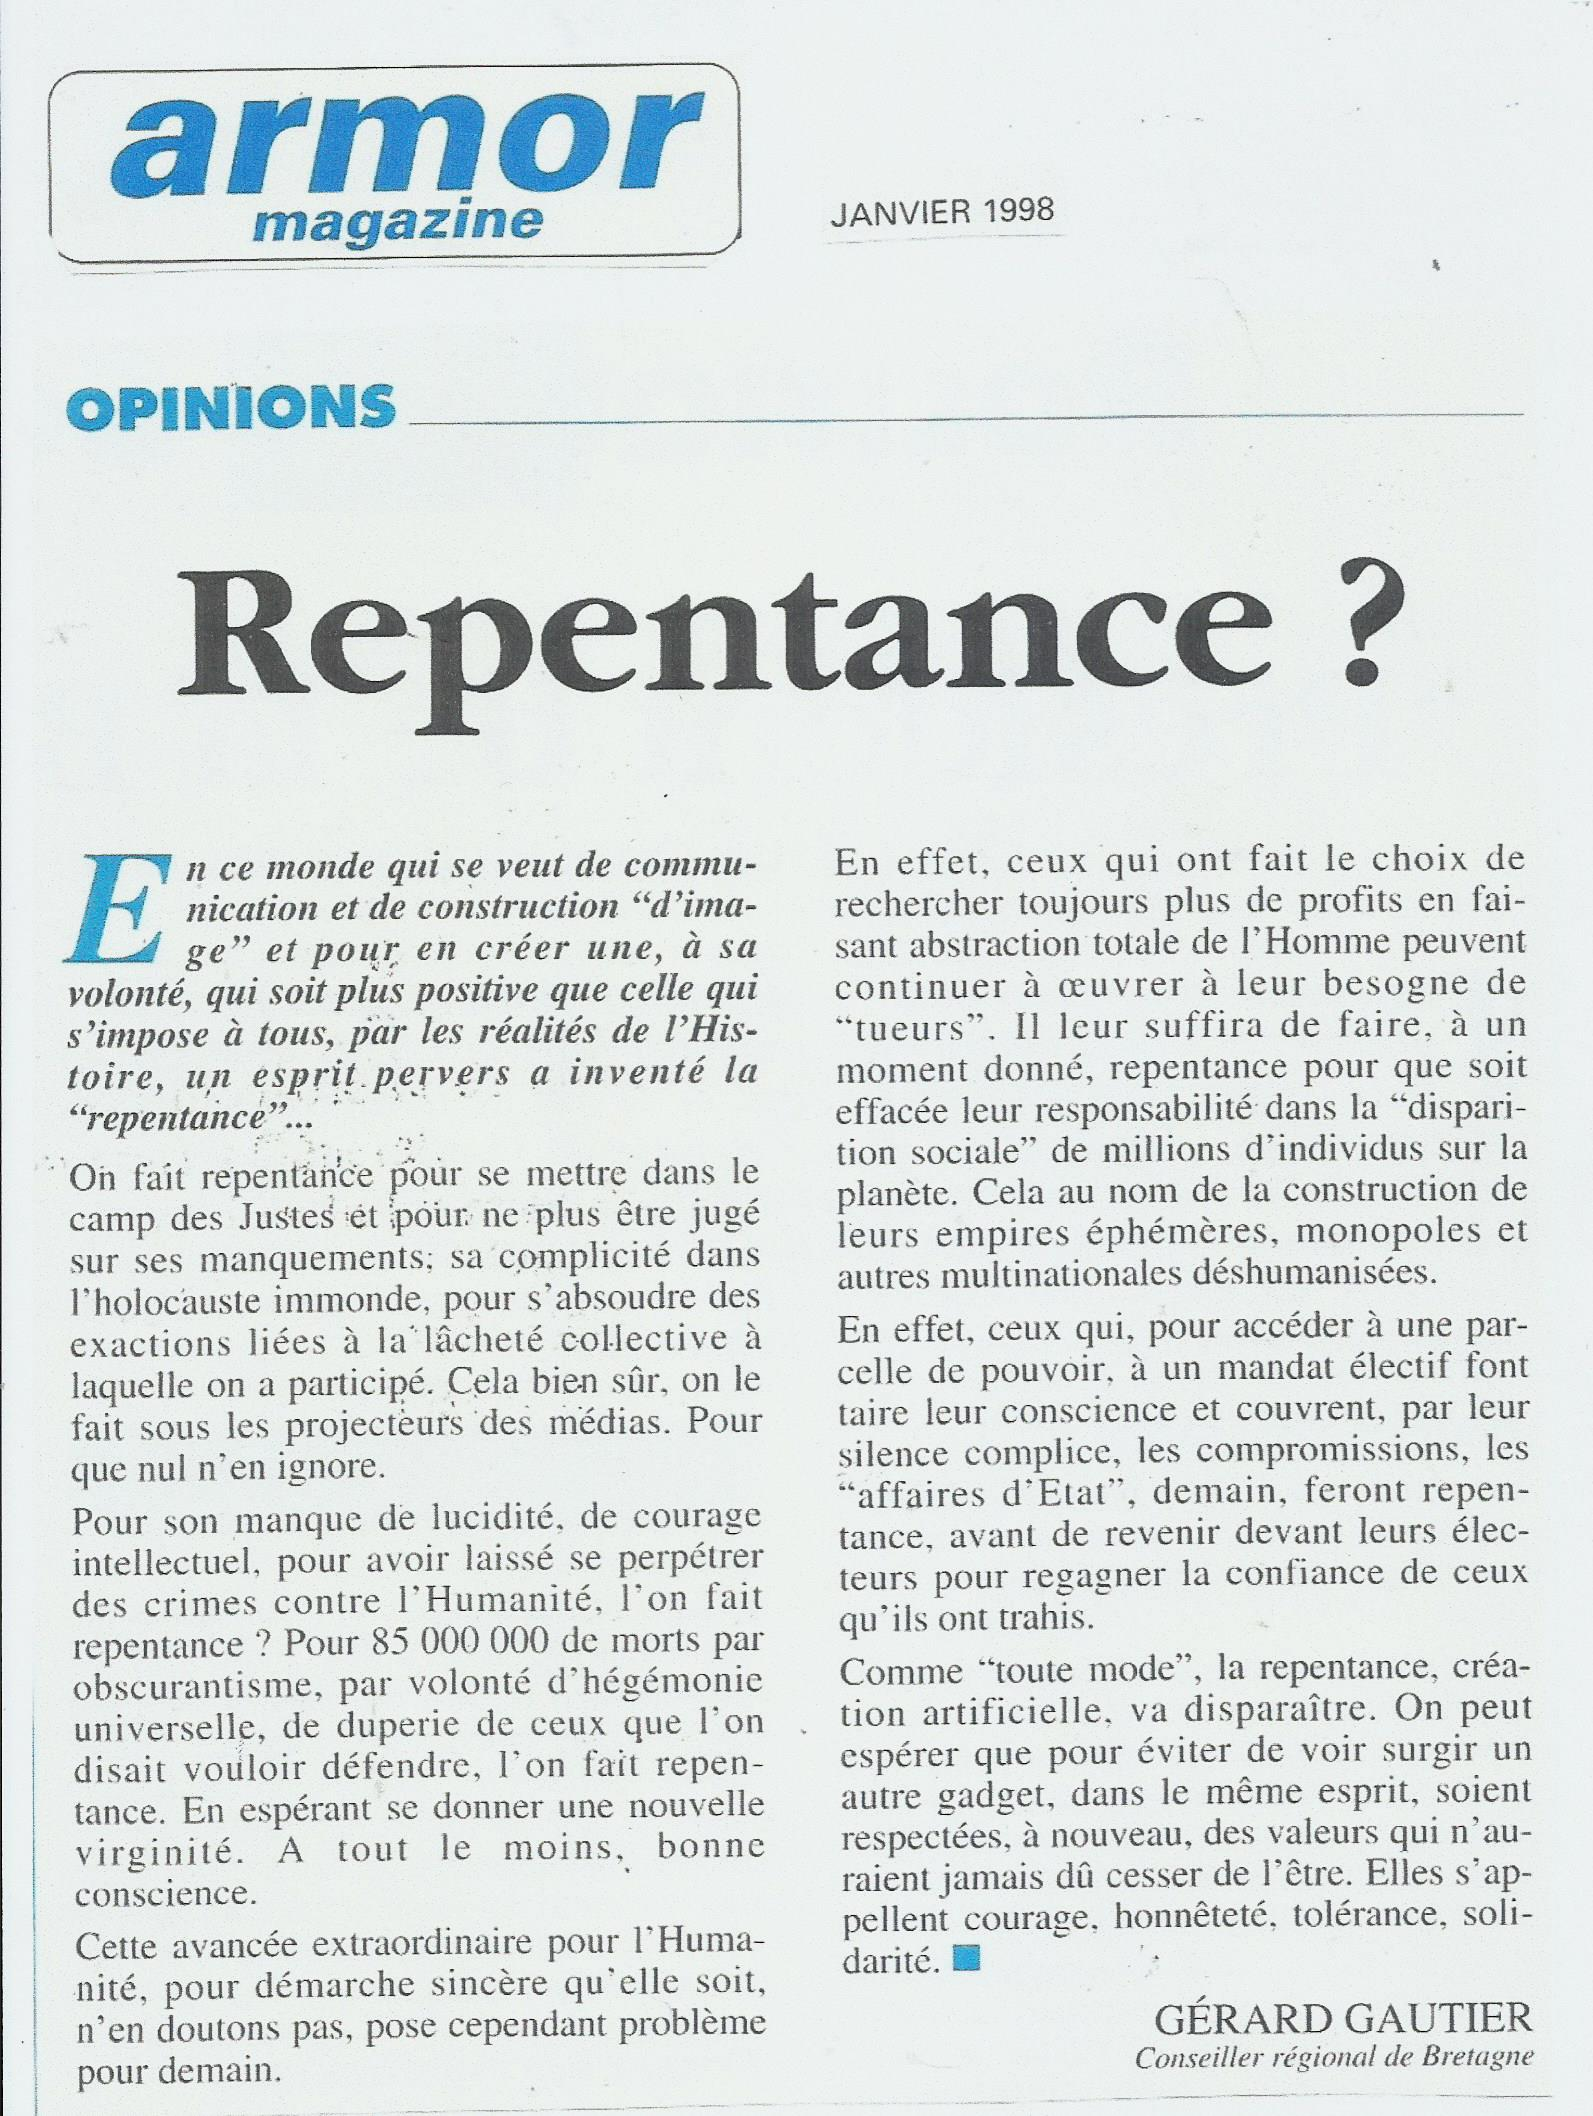 BCE Démocratie 1998 Armor Magazine Repentance